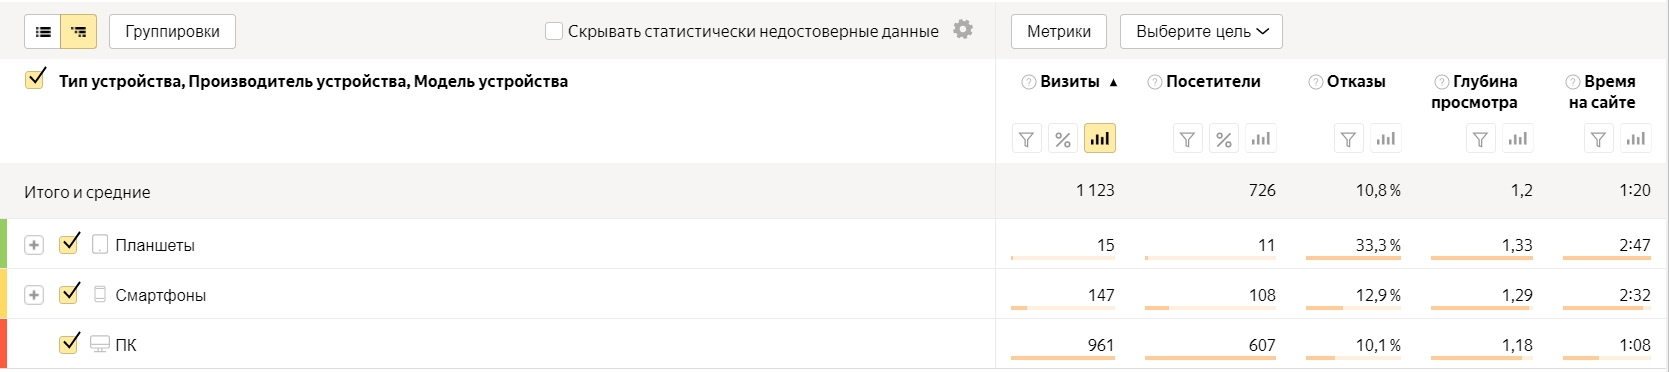 Анализ трафика в Яндекс.Метрике – отчет по устройствам